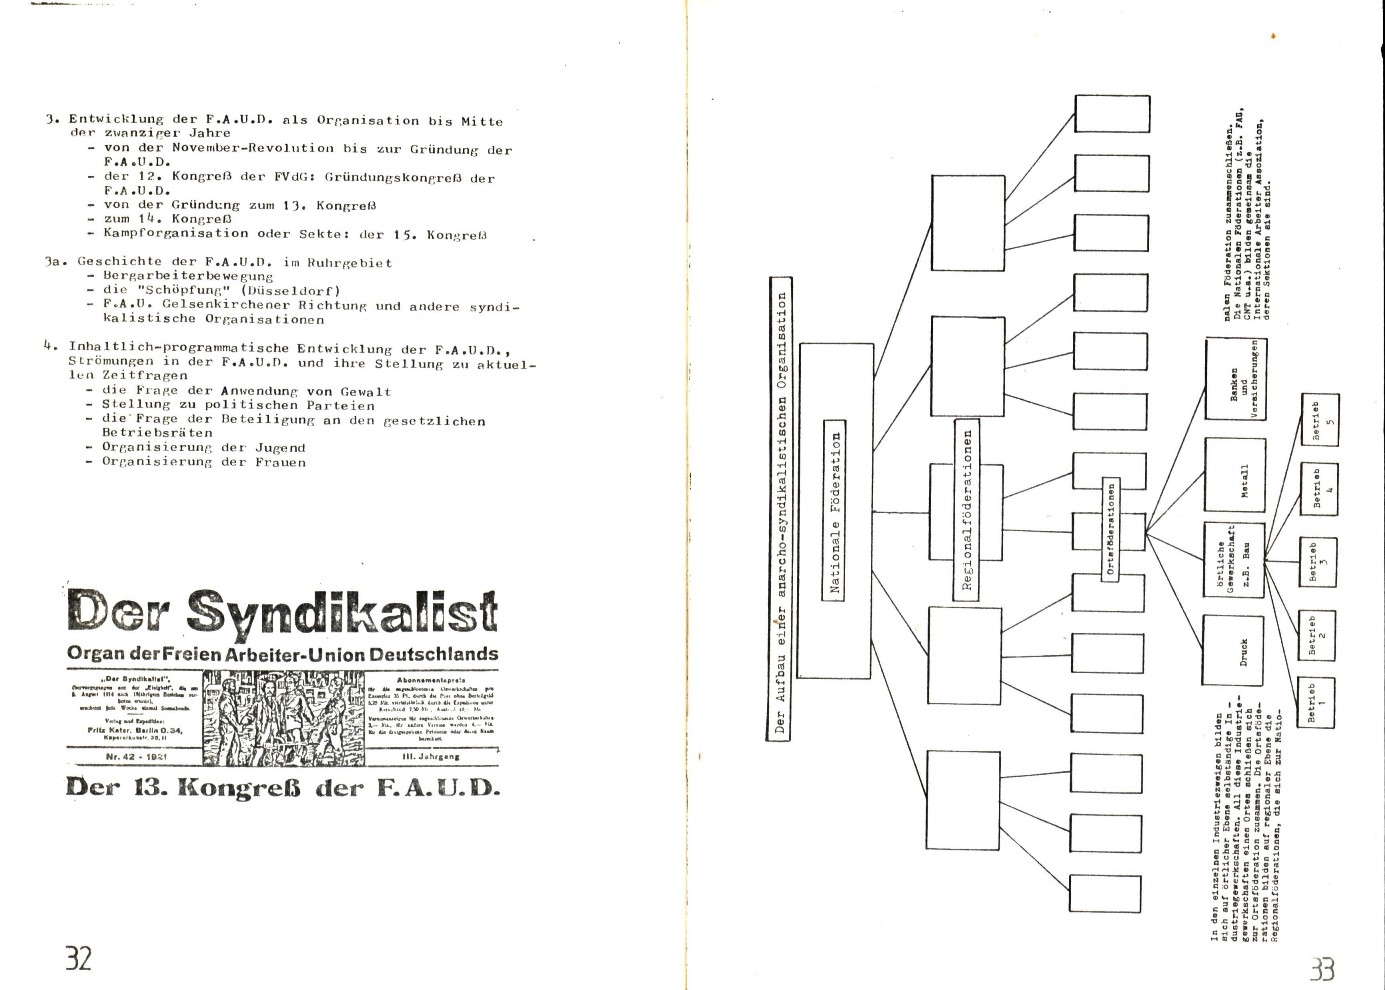 FAU_1979_Arbeitsgrundlage_17